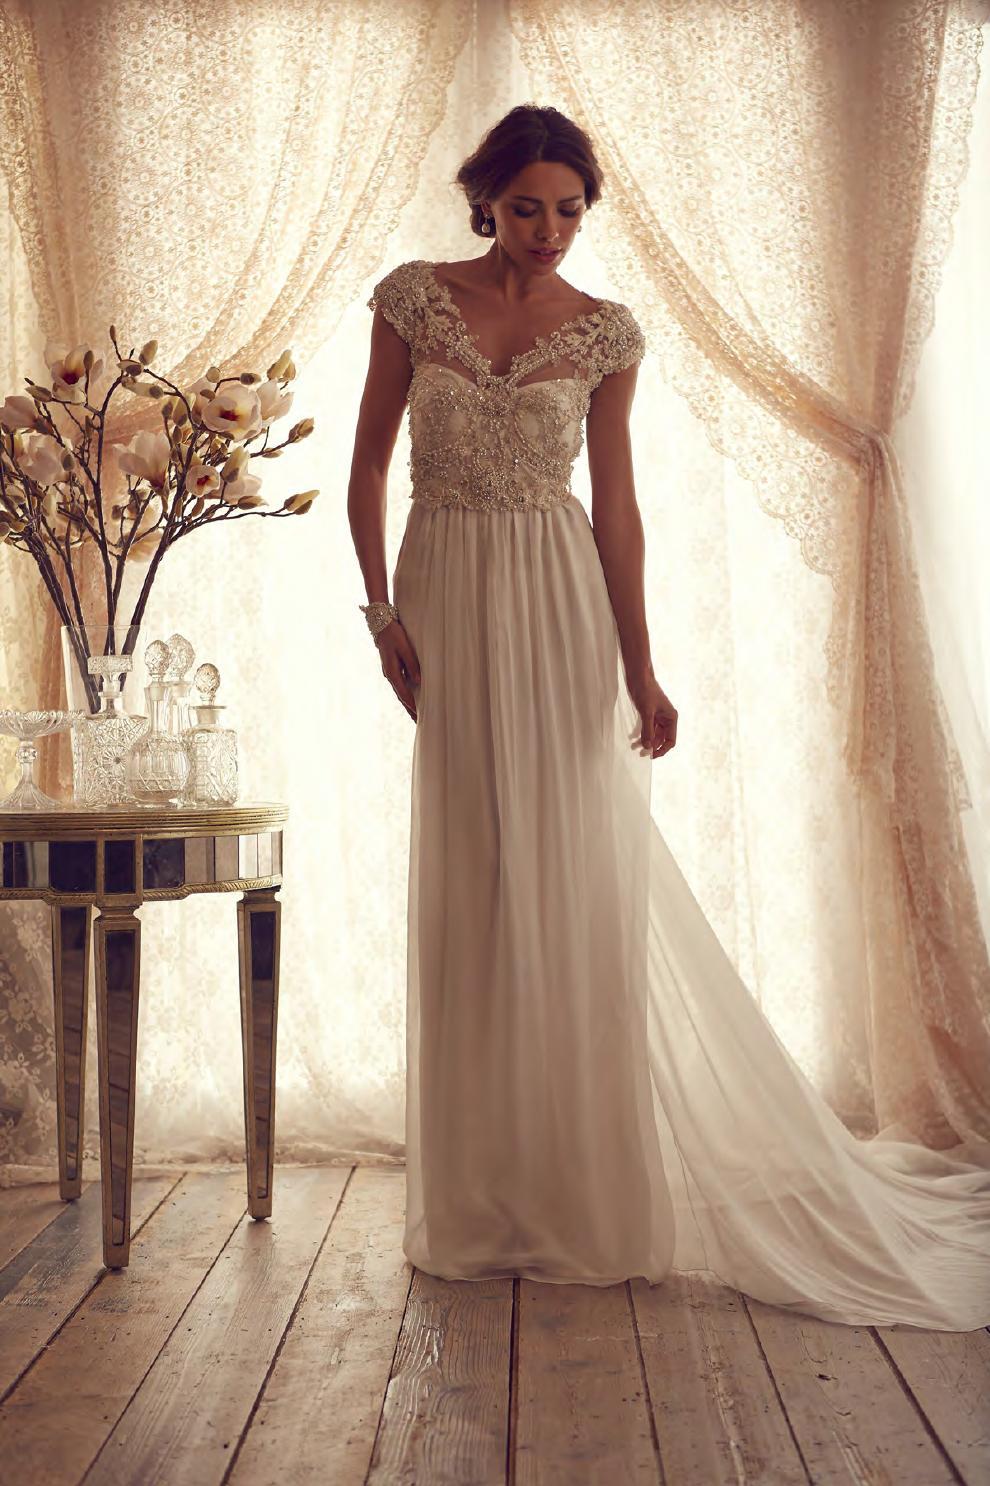 Aliexpress.com : Buy Cap Sleeved Vintage Ivory Lace Wedding Dress ...